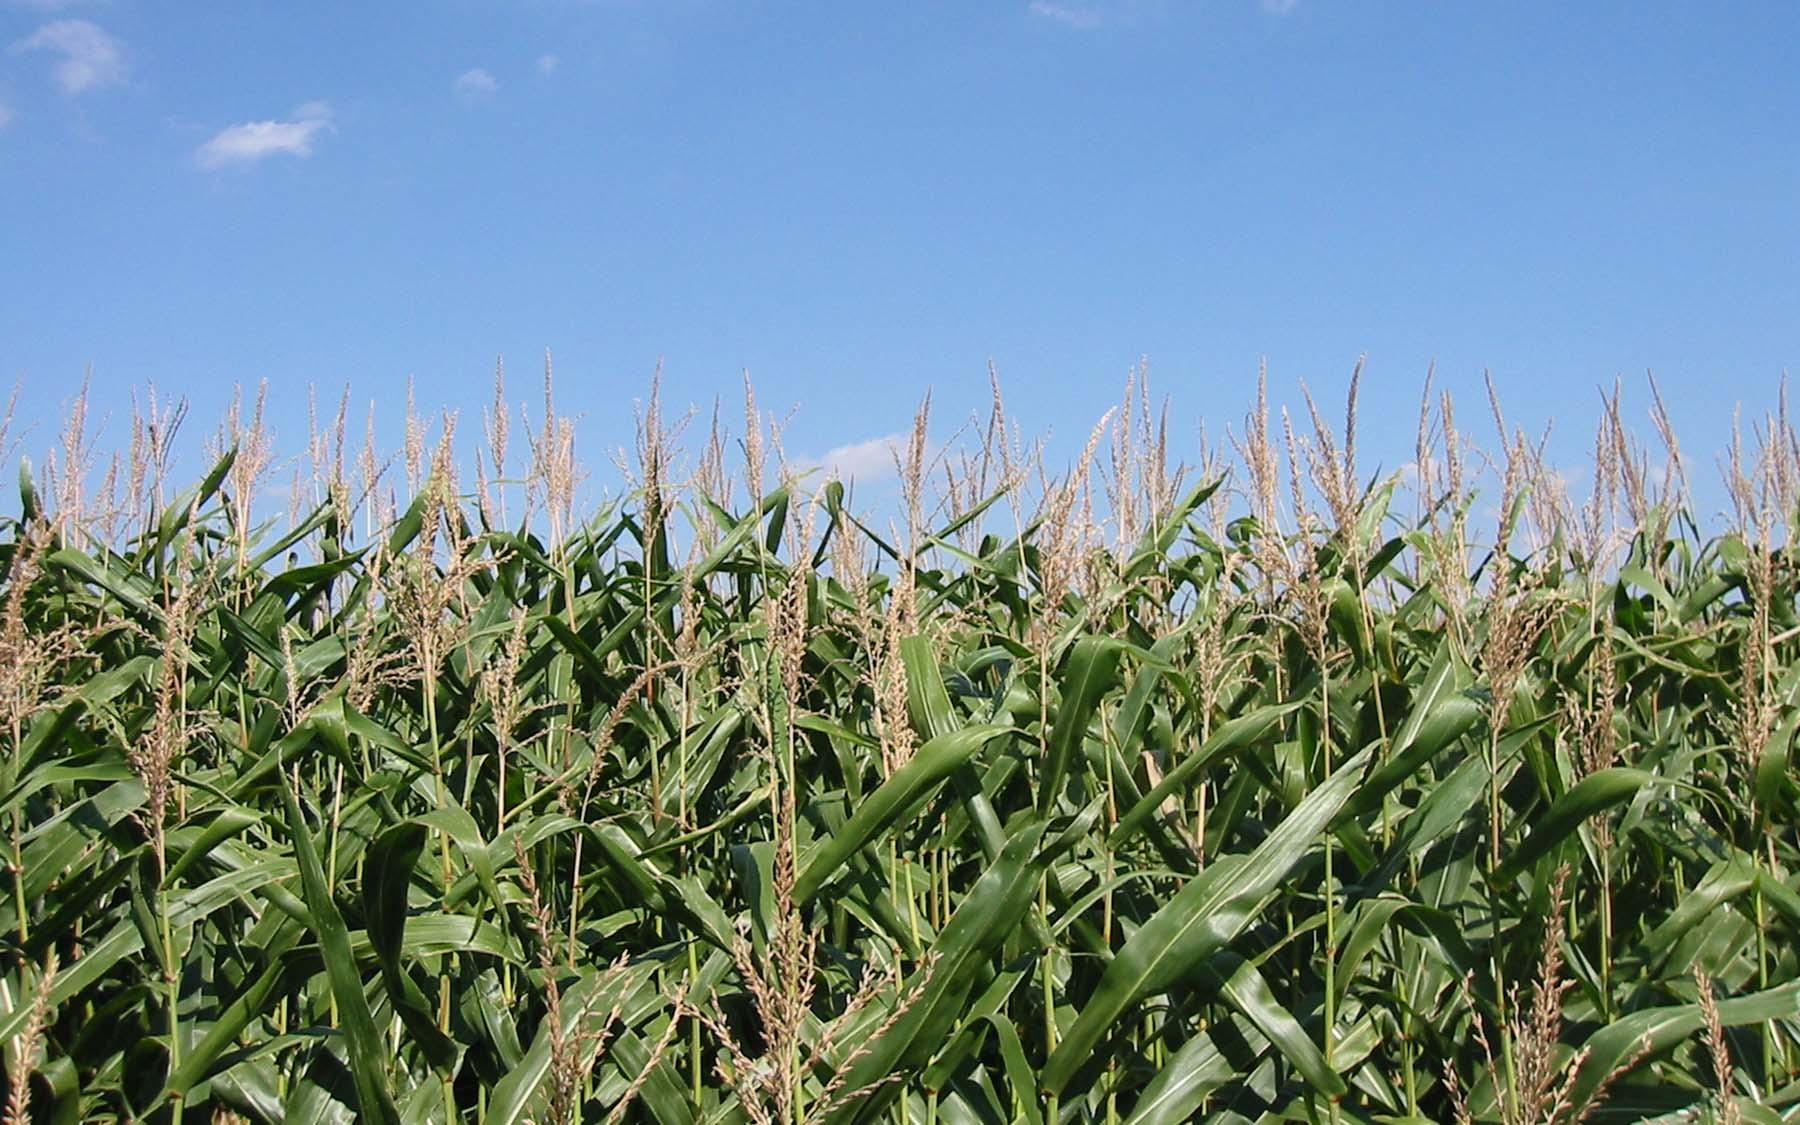 Maize field crops